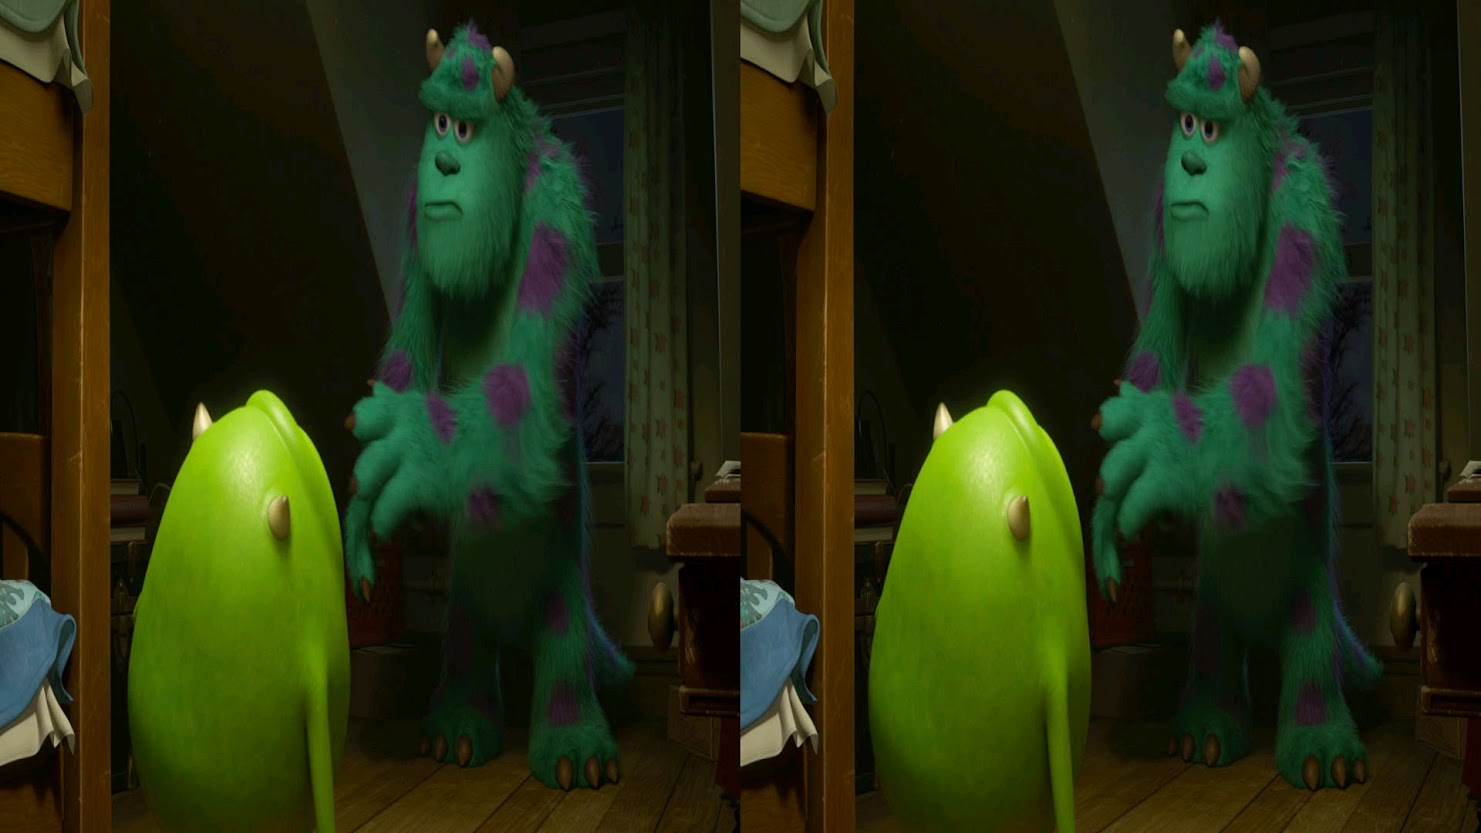 Monstros 3D Half-SBS BluRay 1080p Dual Áudio  Elite dos BluRays